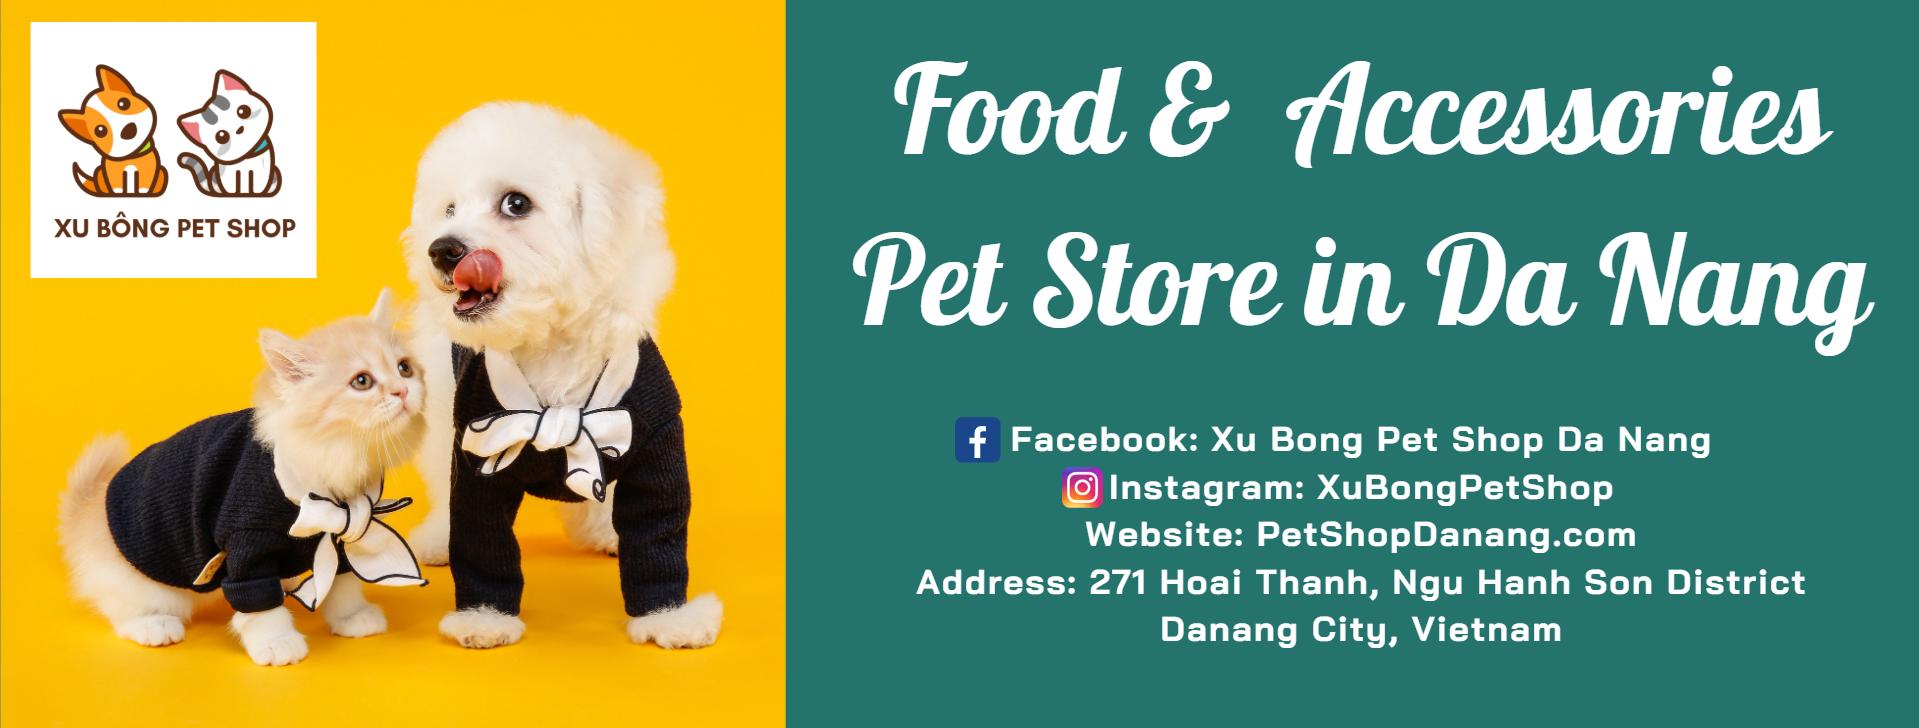 XuBong Pet Shop Danang - Pet Store - Dog & Cat Store *English